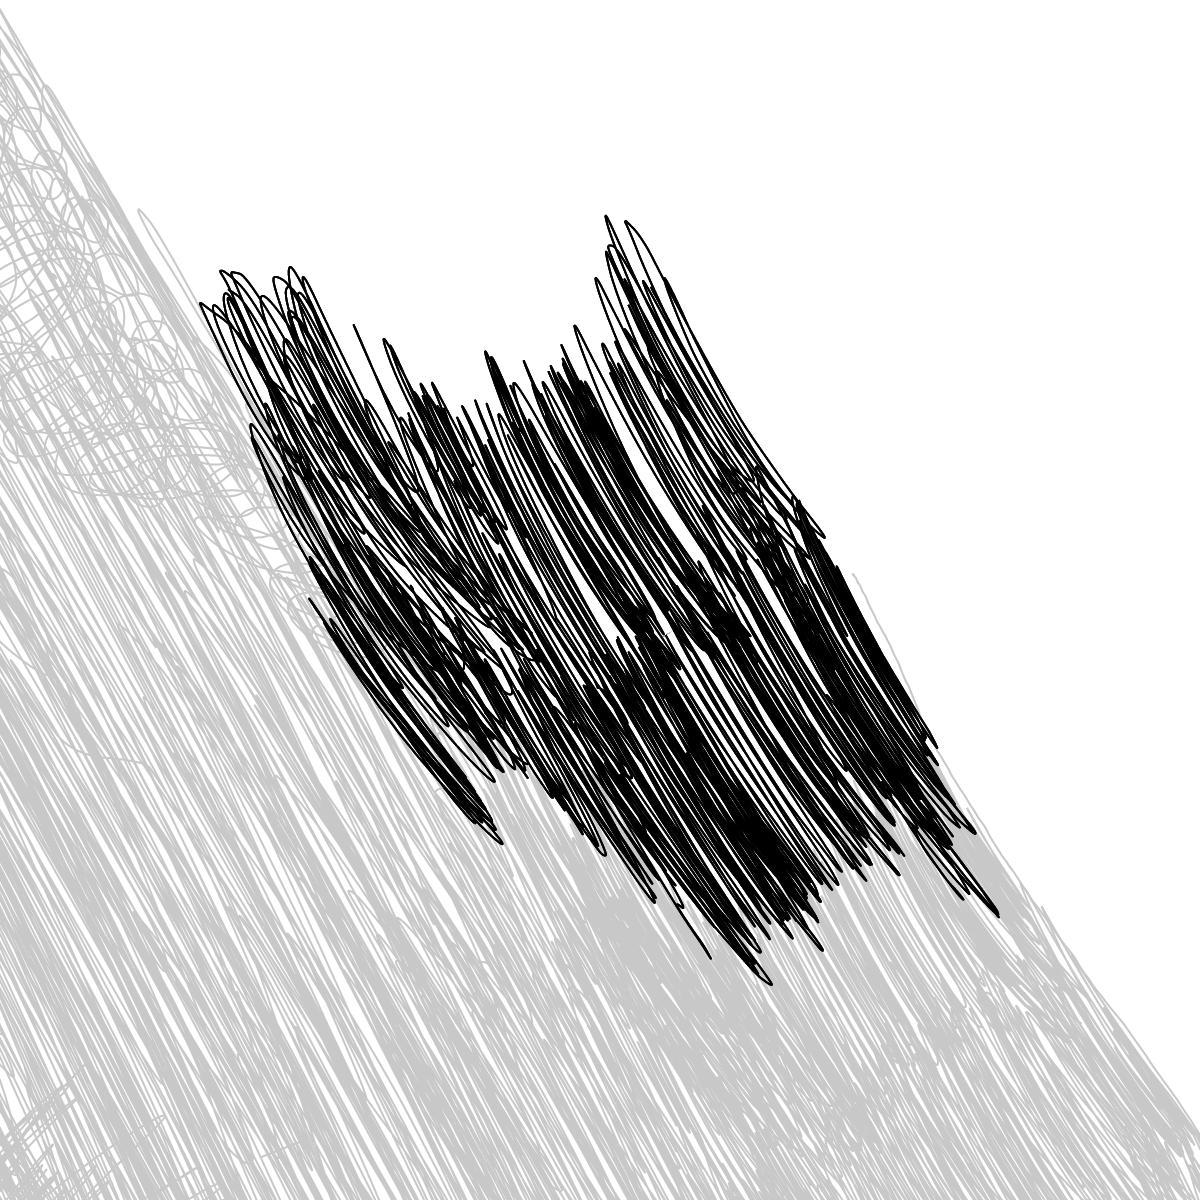 BAAAM drawing#8500 lat:52.4880027770996100lng: 13.4253520965576170